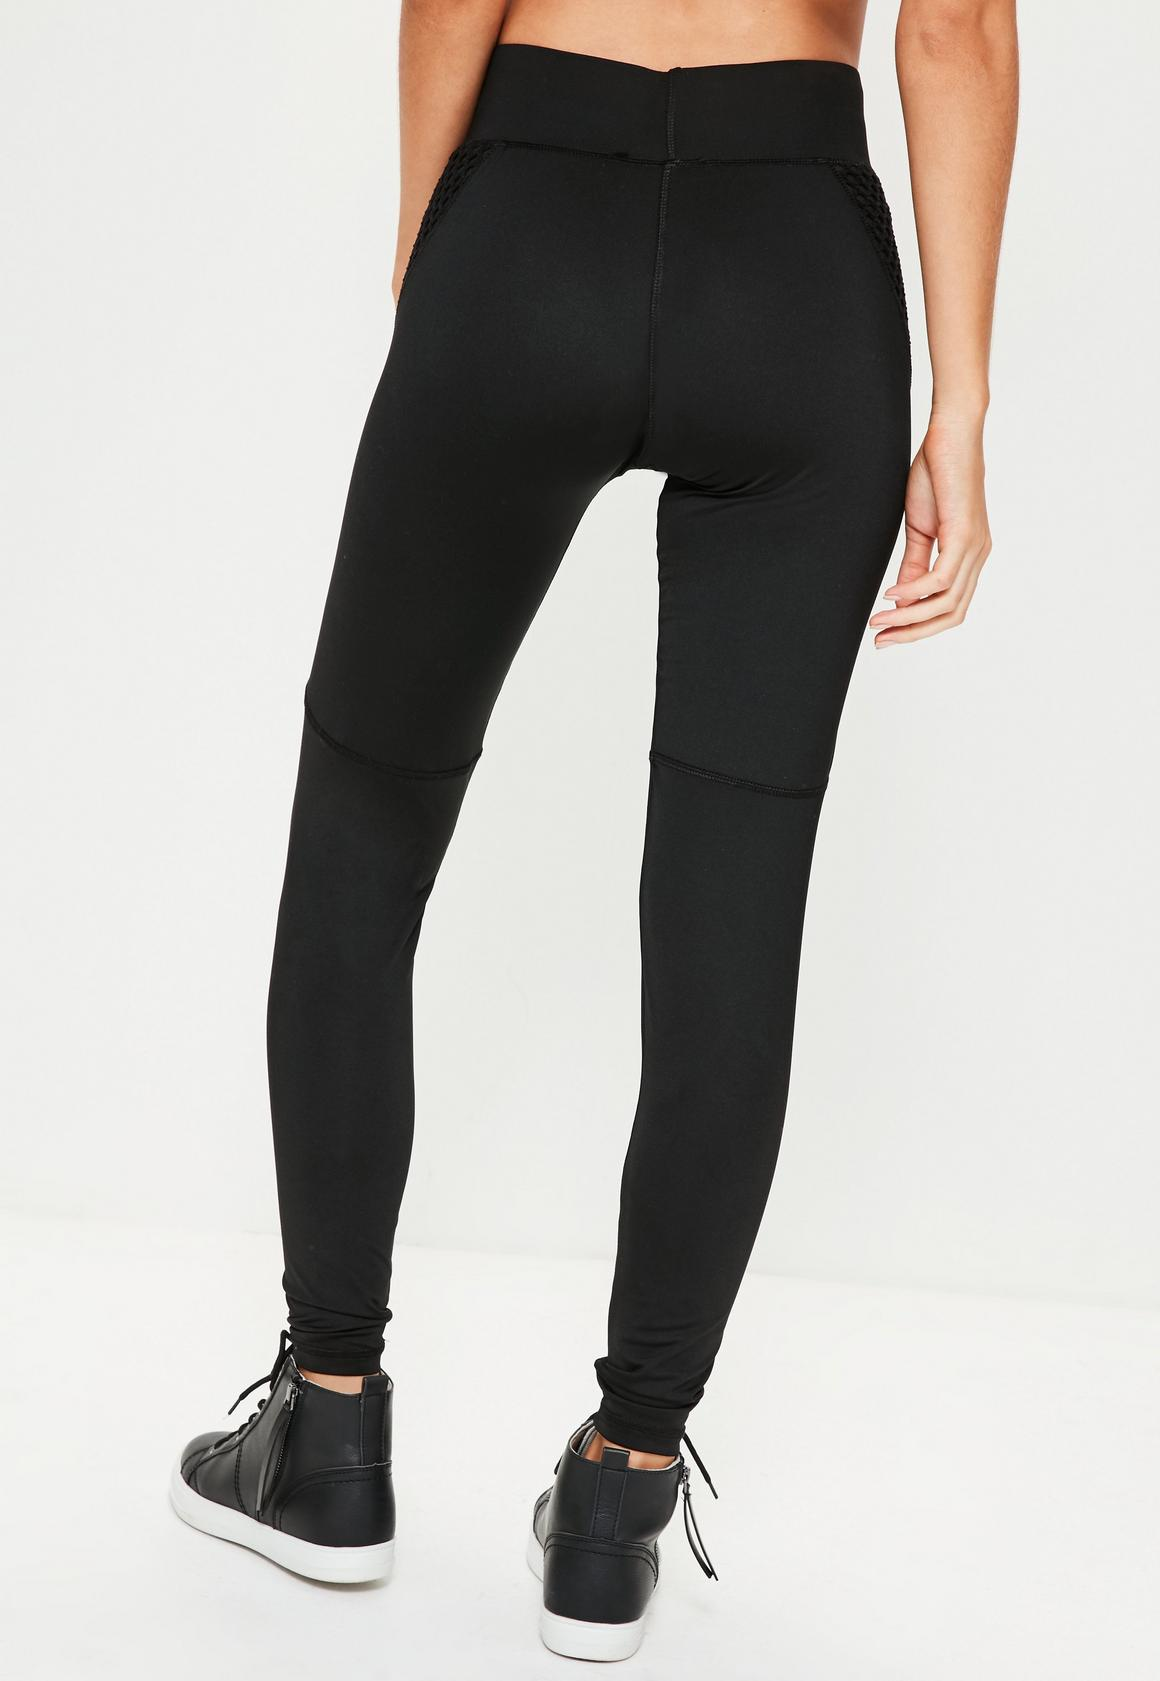 01e37a73ba3fd0 Missguided Active Black Fishnet Side Sports Leggings, Black at £10 ...